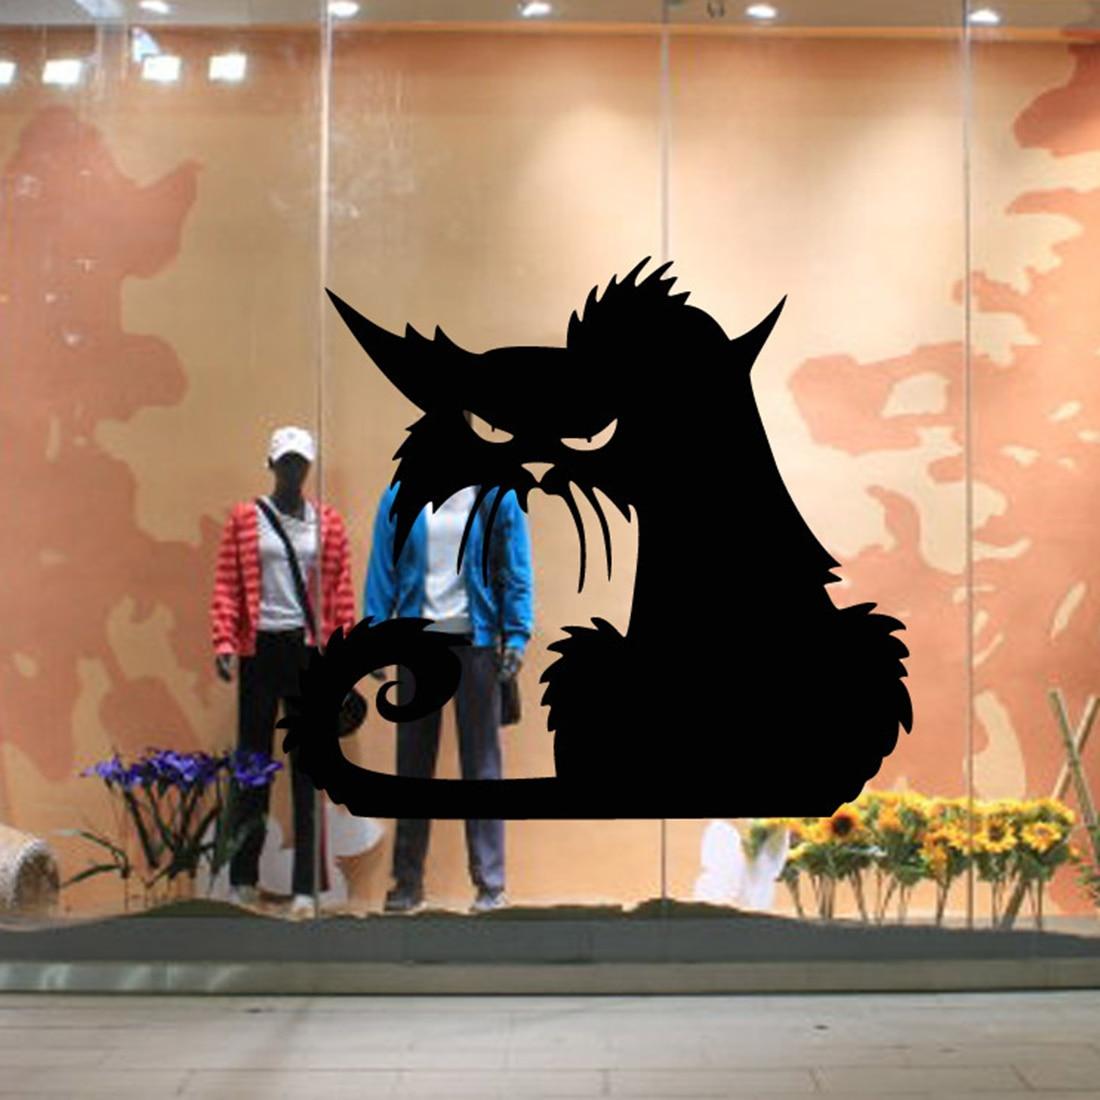 Zwart glas muur koop goedkope zwart glas muur loten van chinese ...